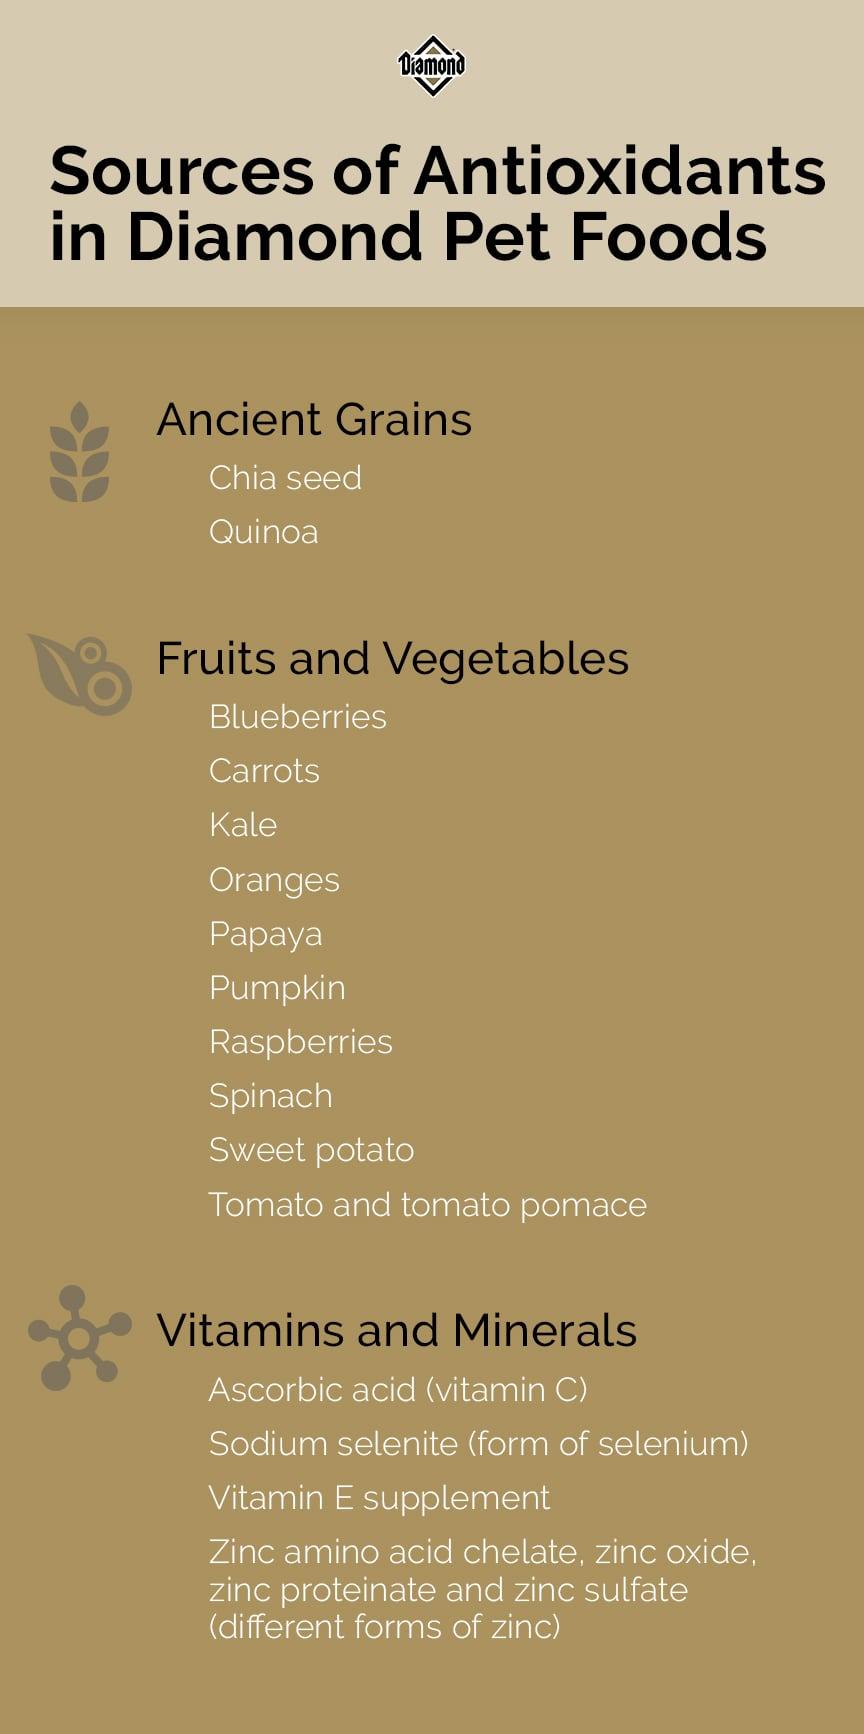 Sources of Antioxidants chart